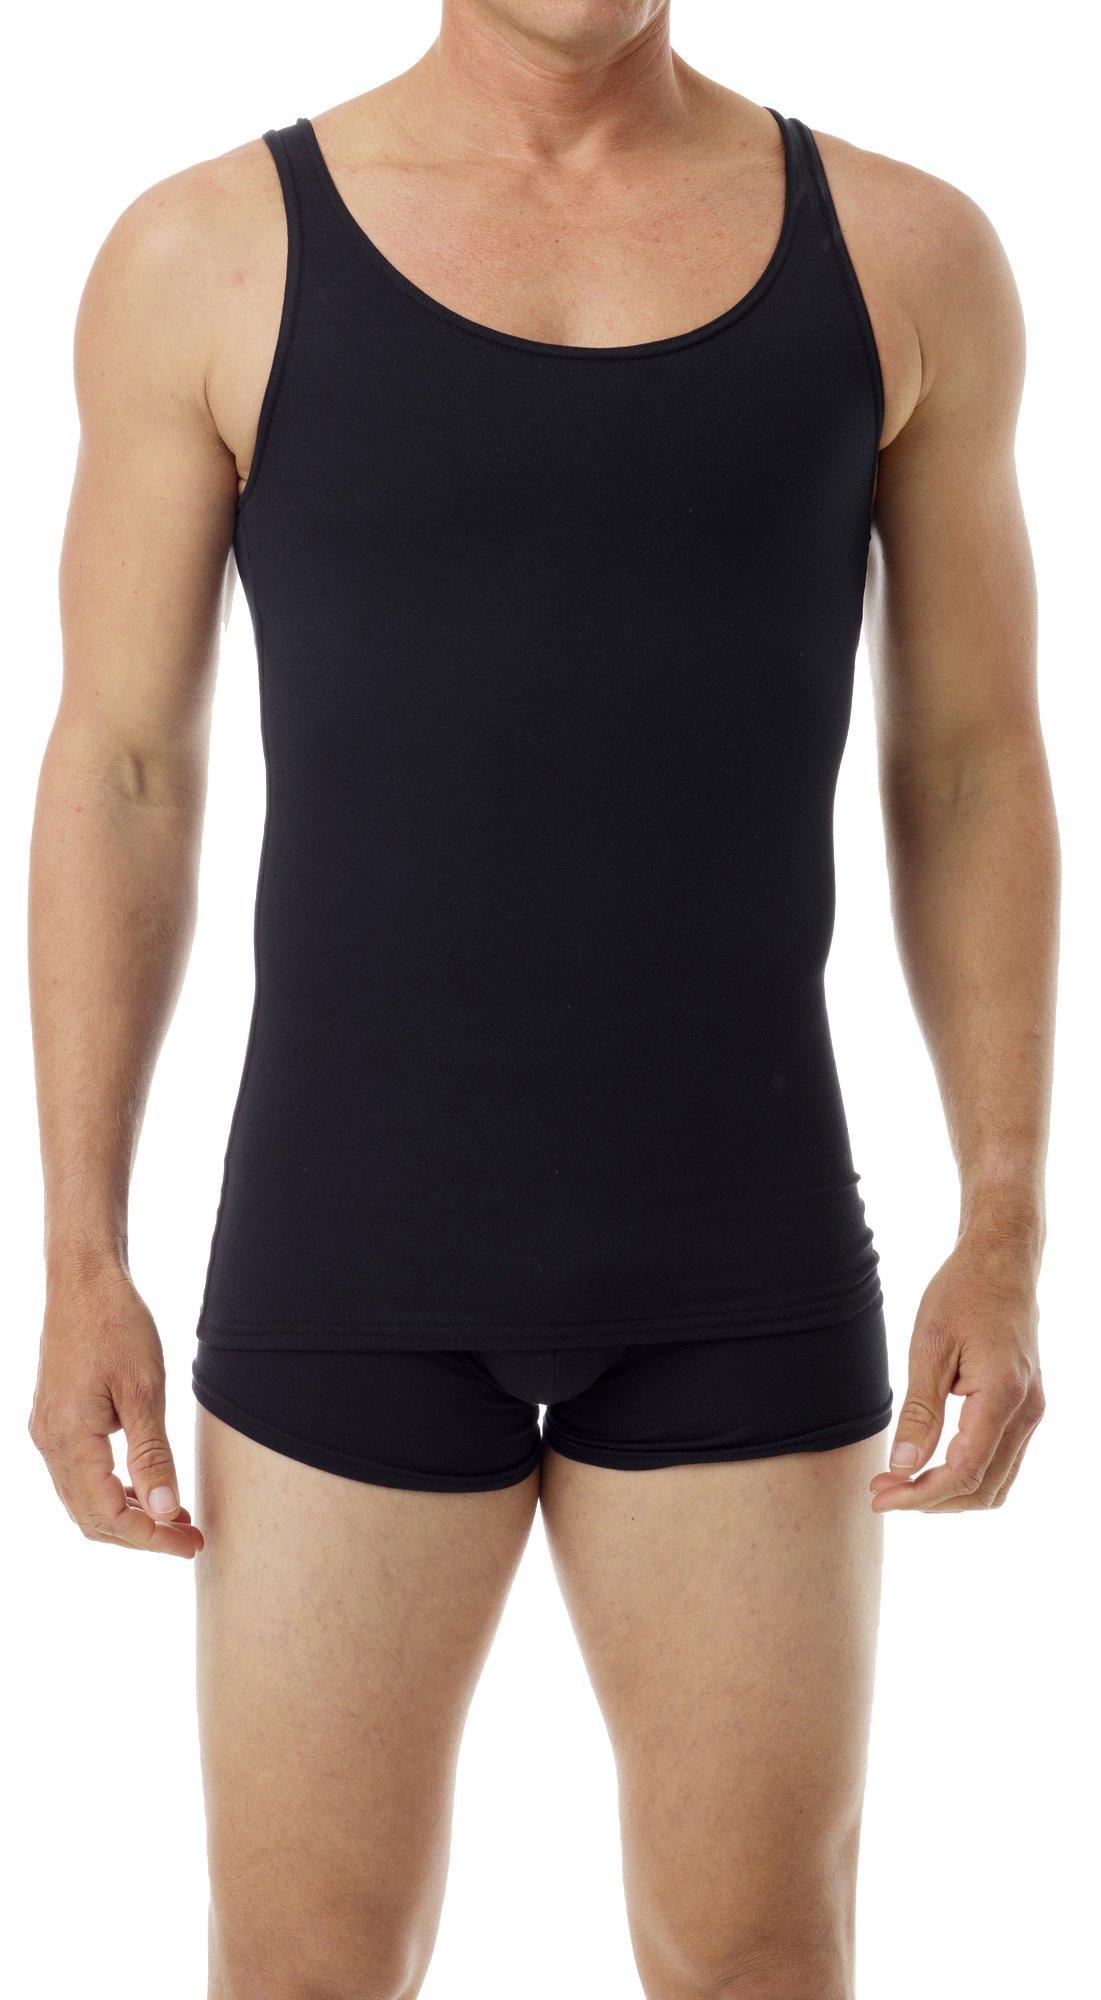 Underworks Cotton Fat and Bulge Concealer Compression Tank Top